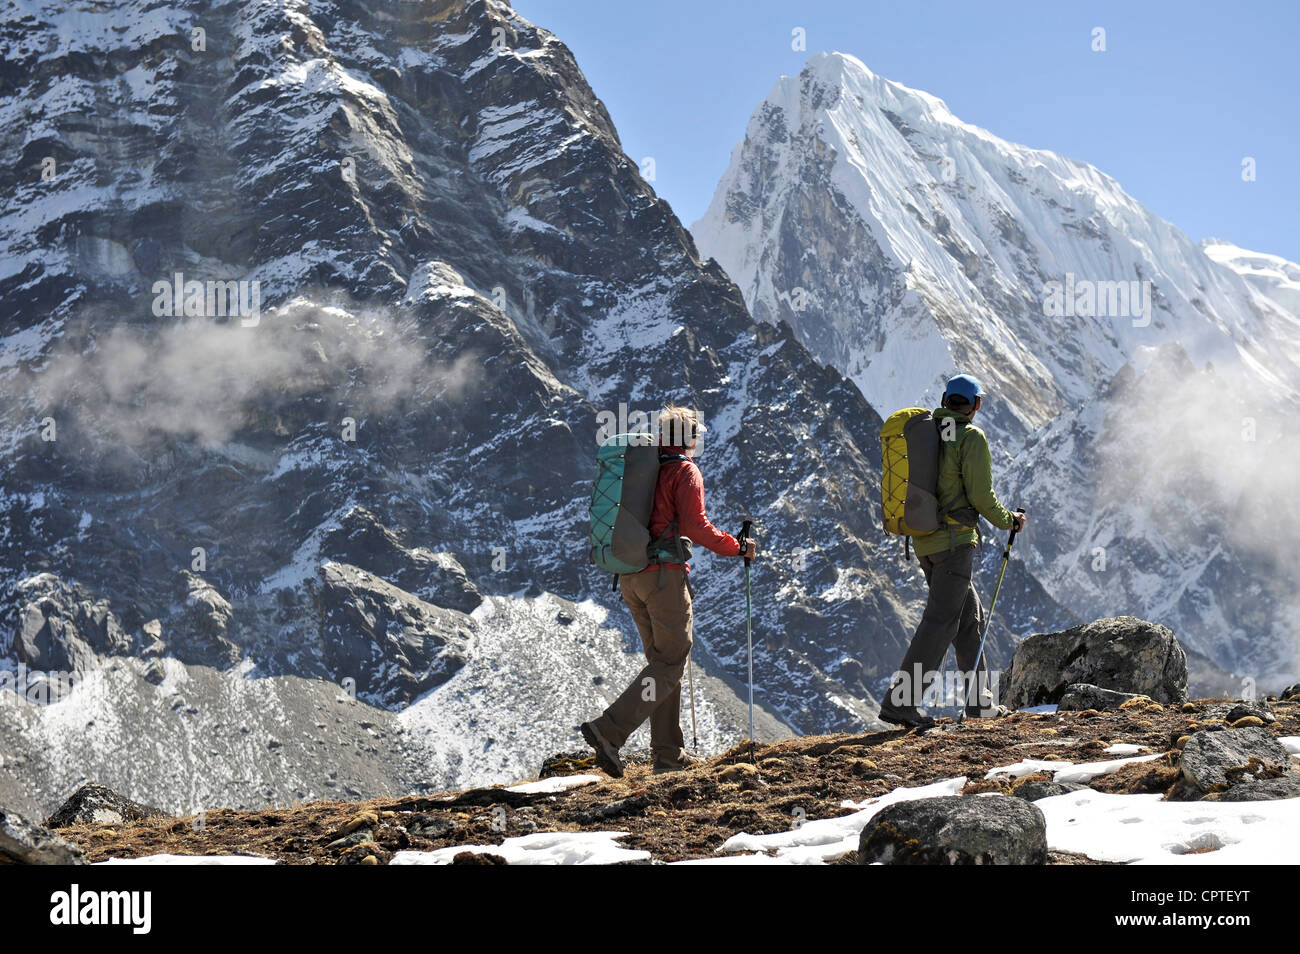 Trekkers hiking along a ridge, Gokyo, Nepal - Stock Image